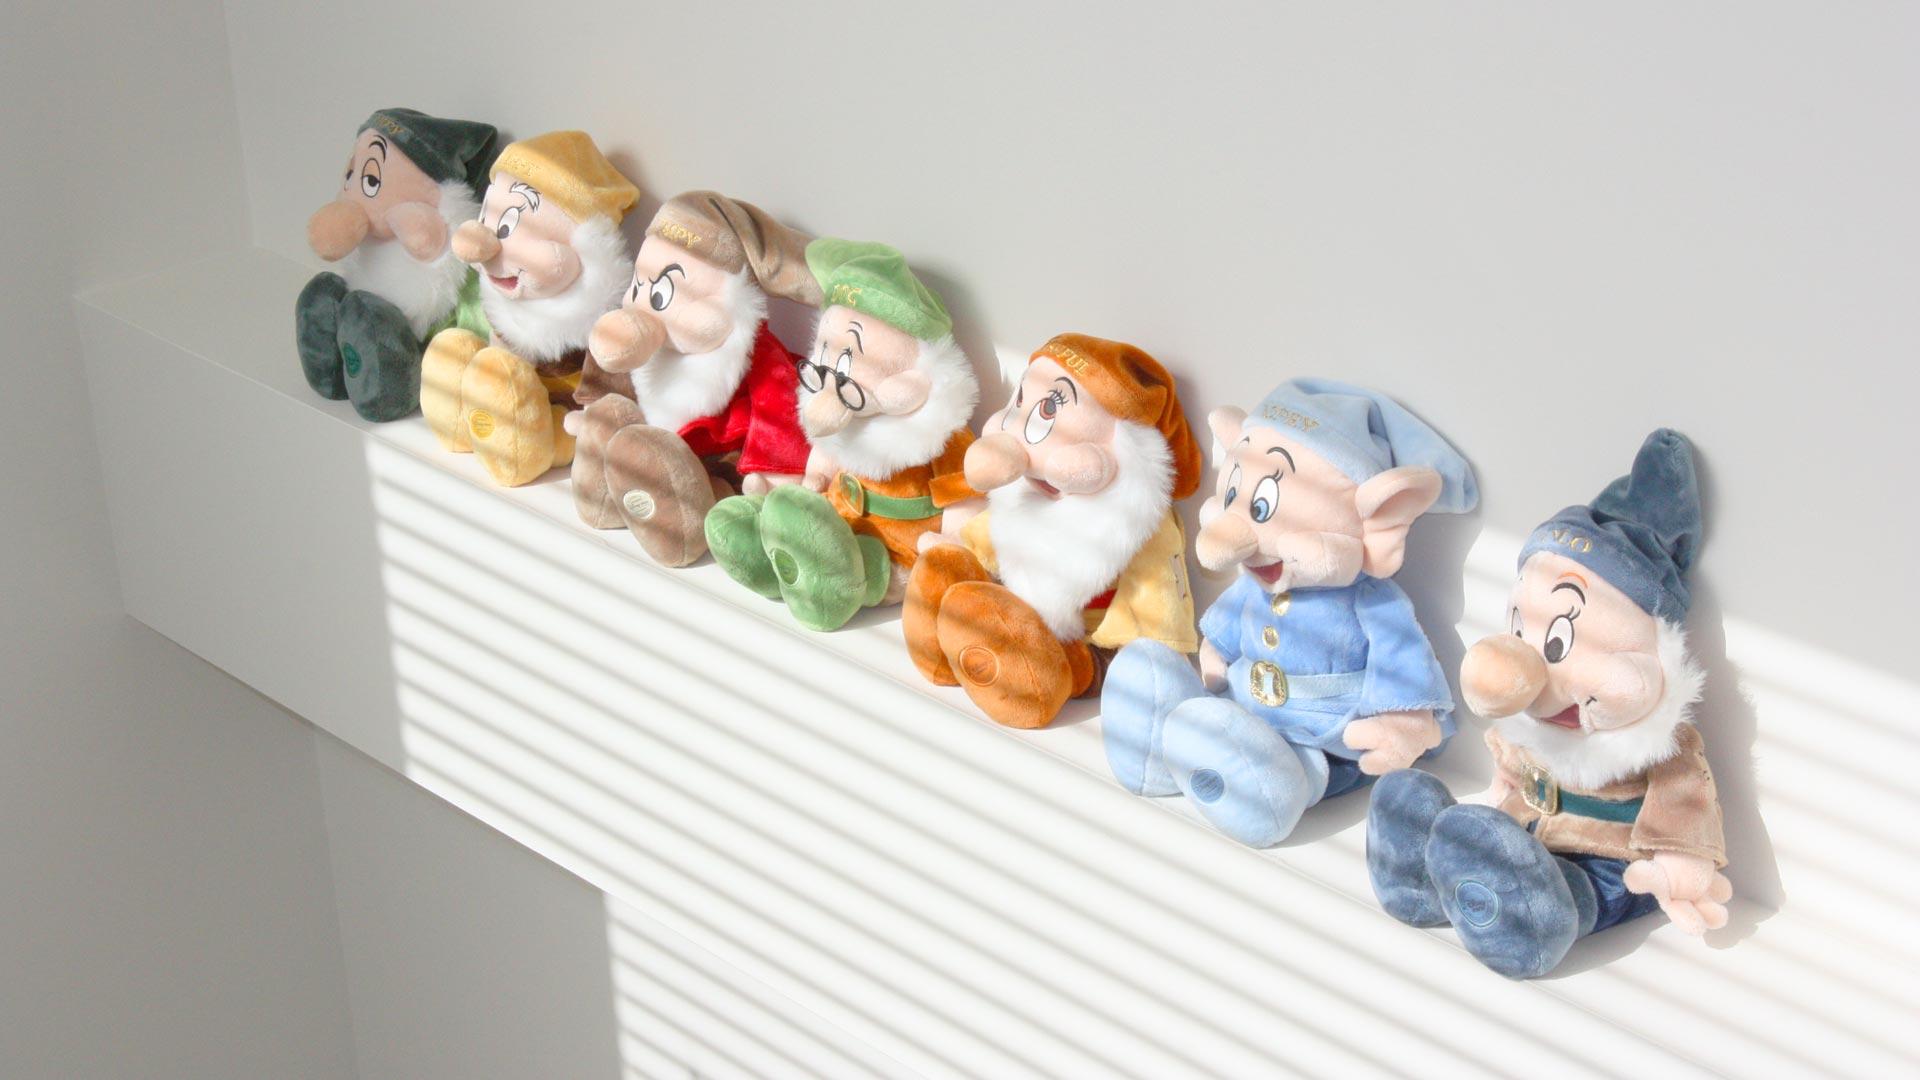 Detalle de peluches - Imagen de galería del Centro de Educación Infantil Gibralfaro